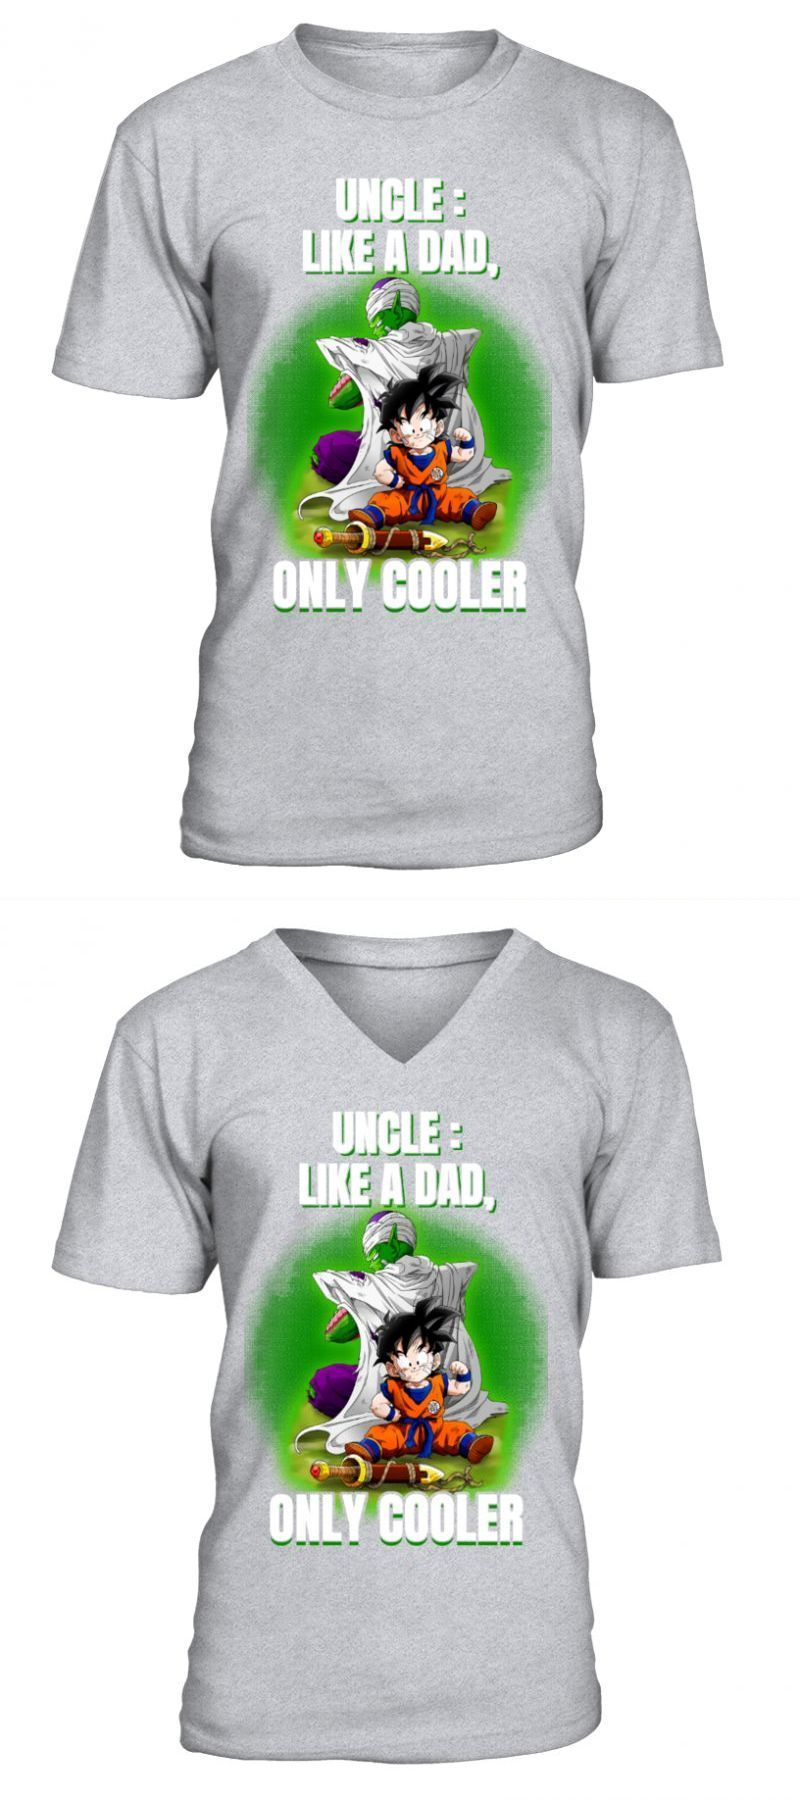 Shirt T Limited Skids Shirts amp;m Children's amp;m Ukh Edition H 0NnOmwv8